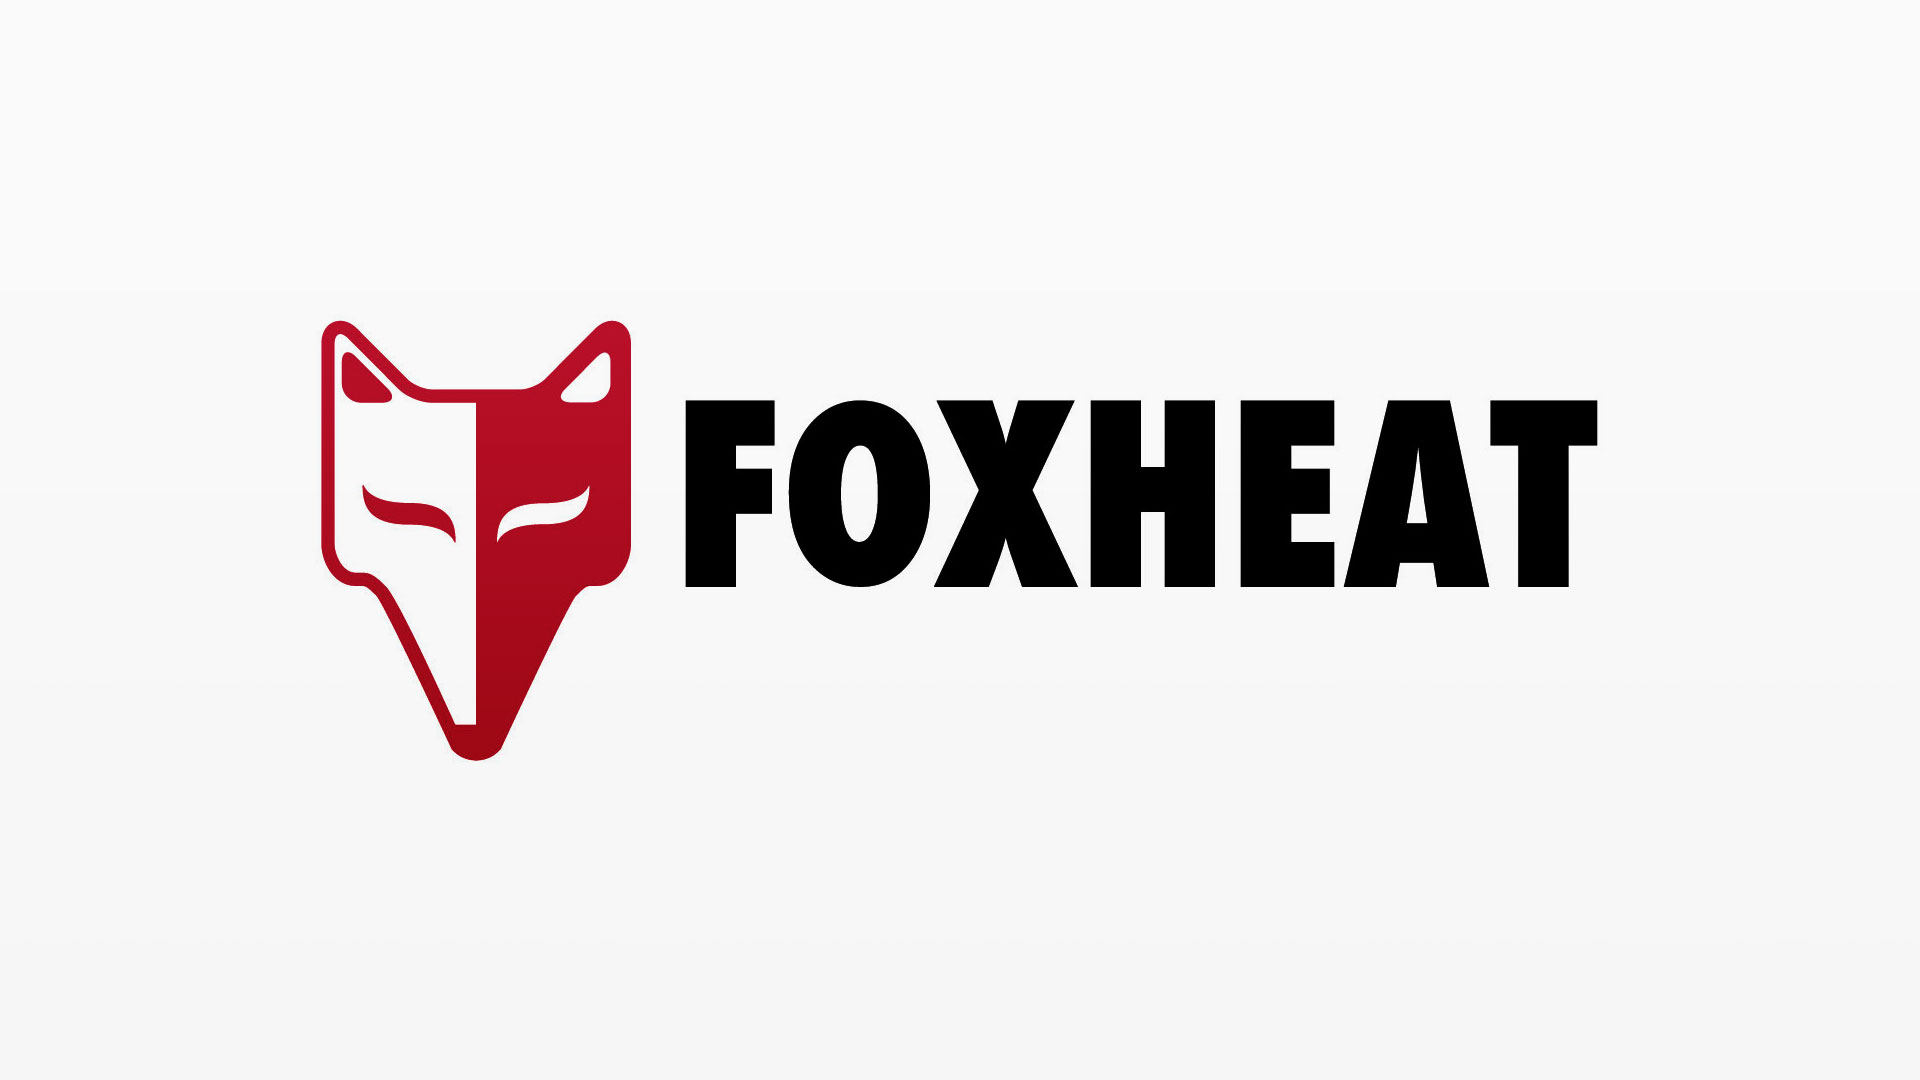 Foxheat-Horz-1920x1080.jpg